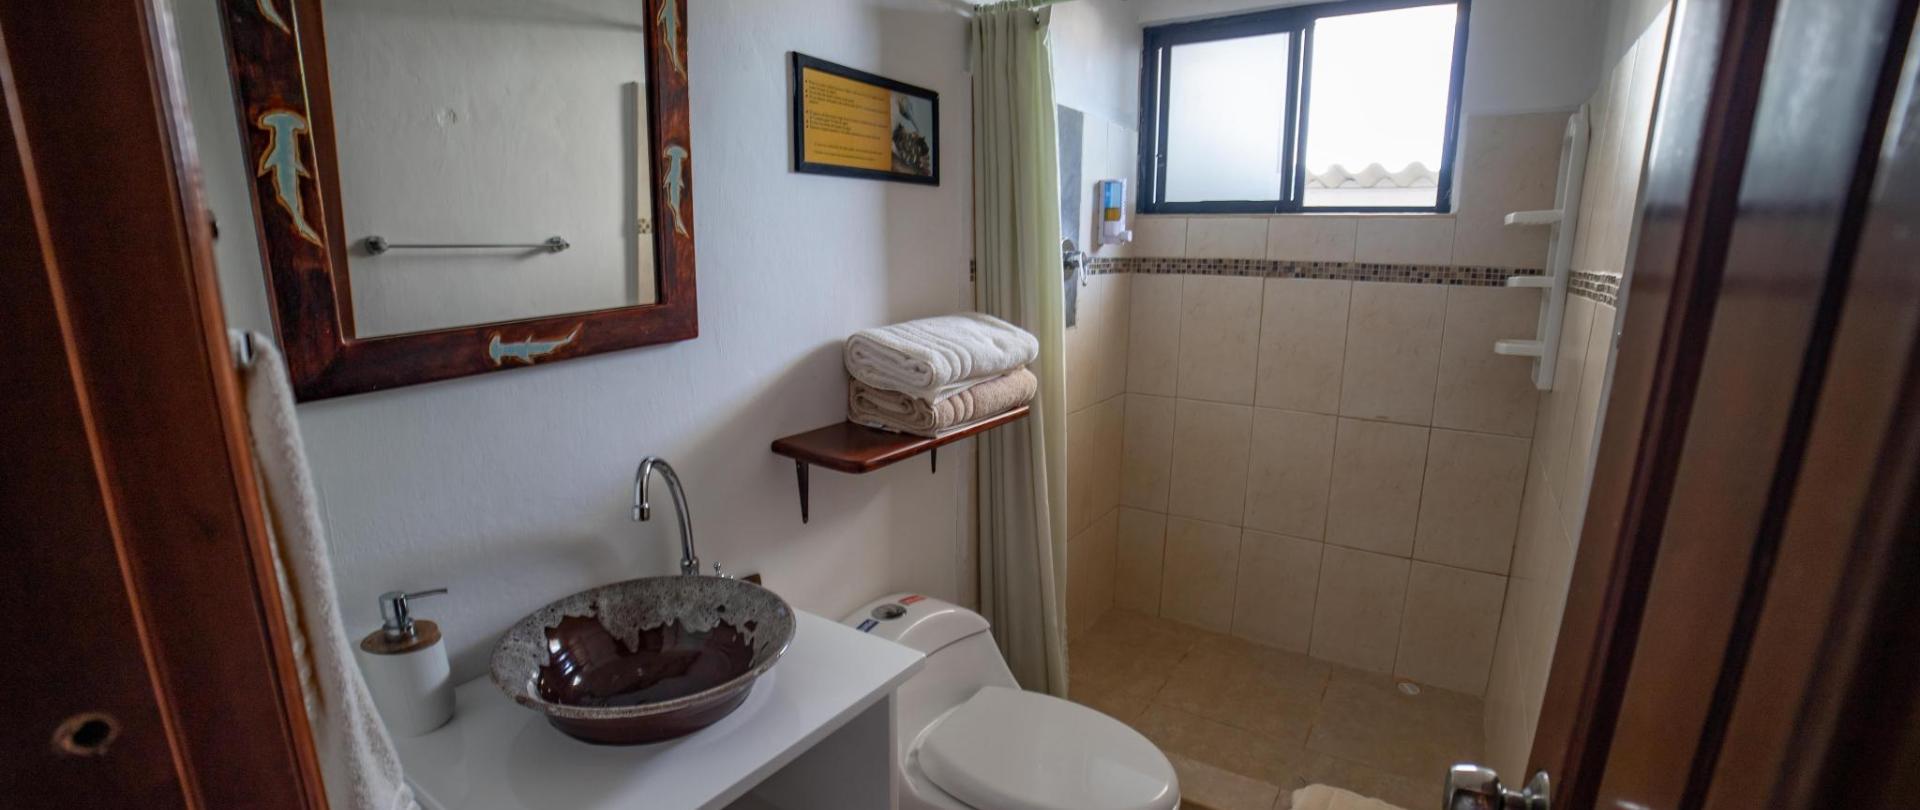 Guest House K-Leta - Pequena (54).JPG